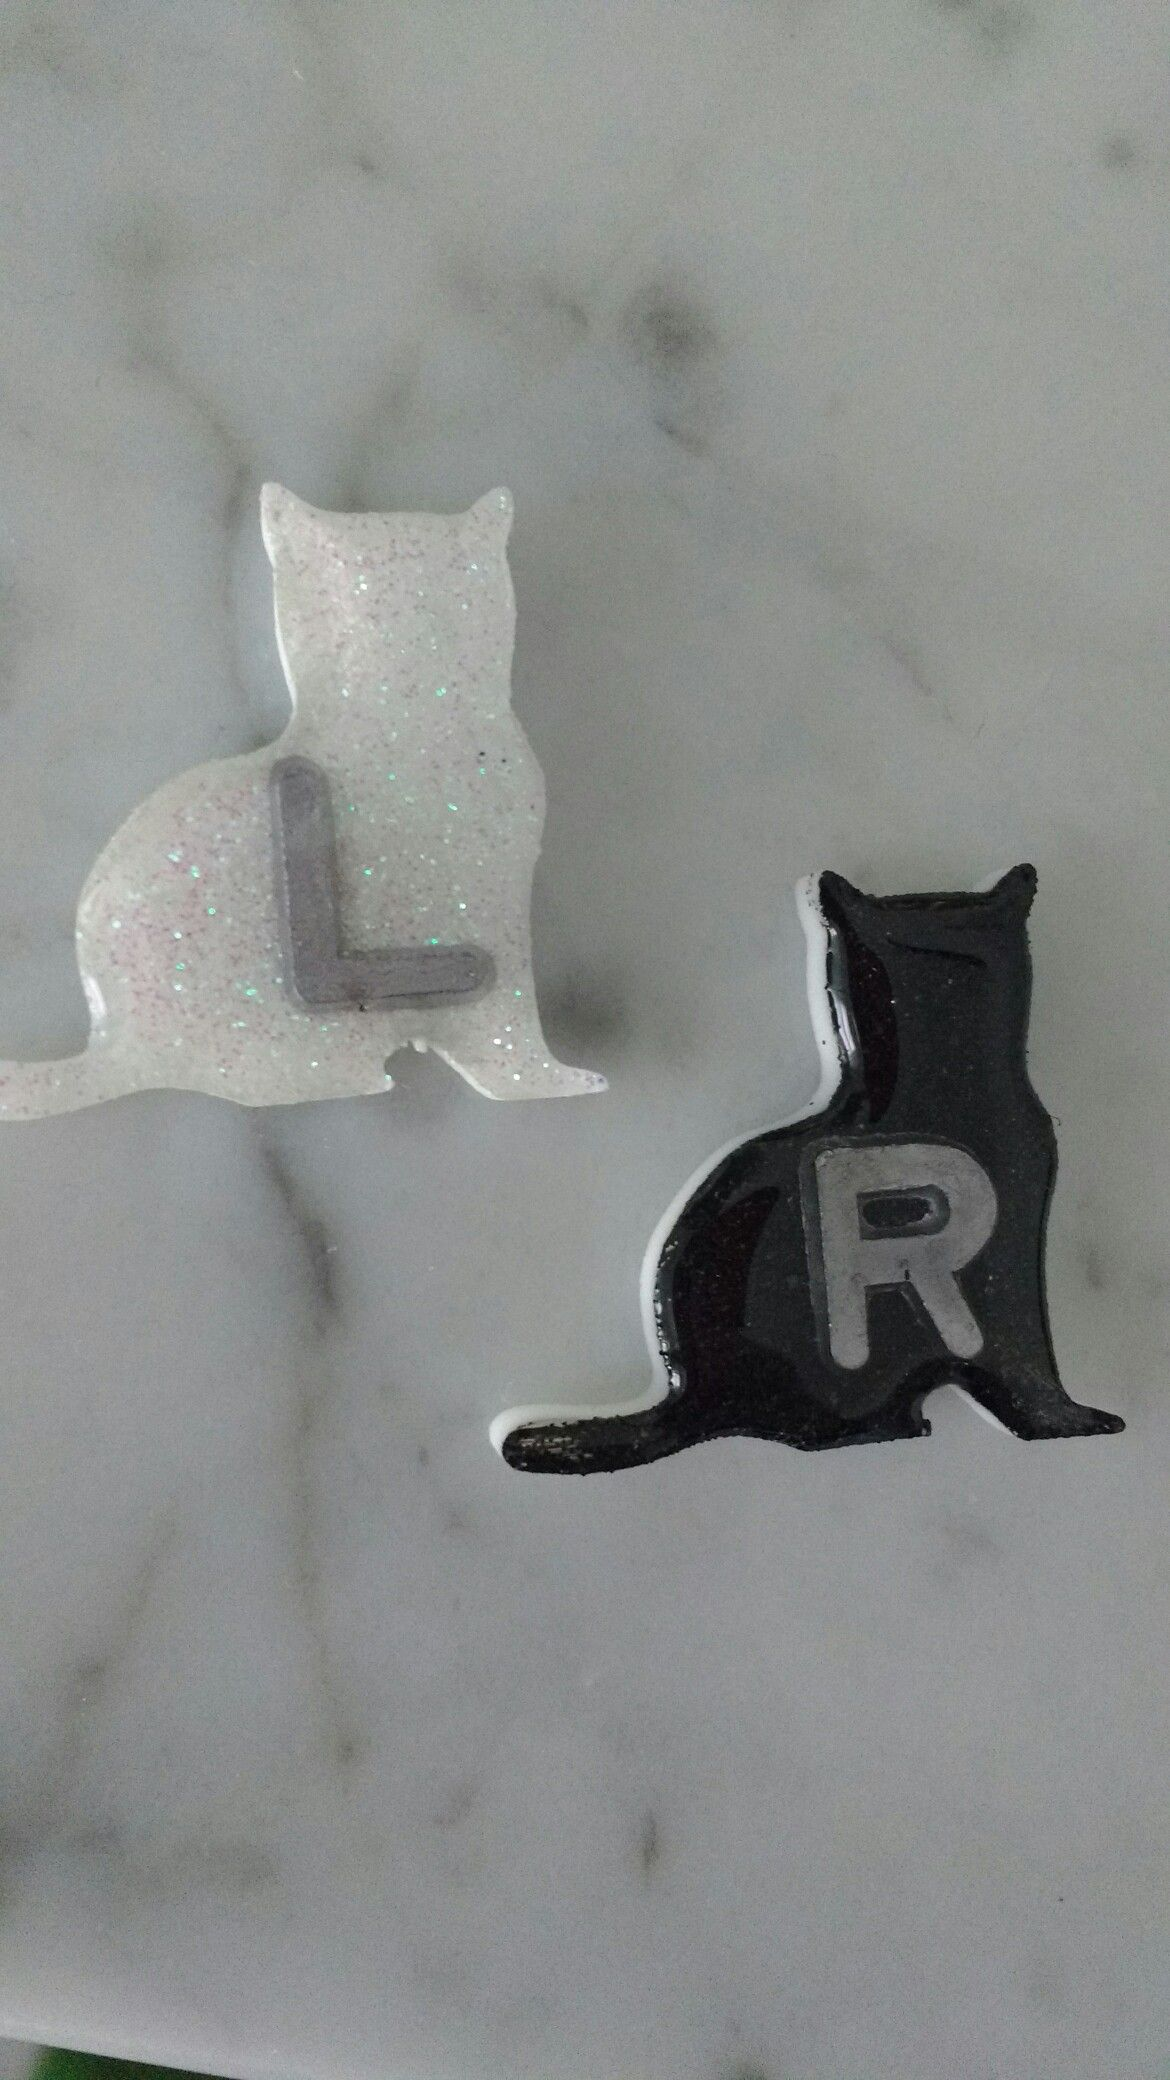 Cute cat XRay Markers made at Rad tech